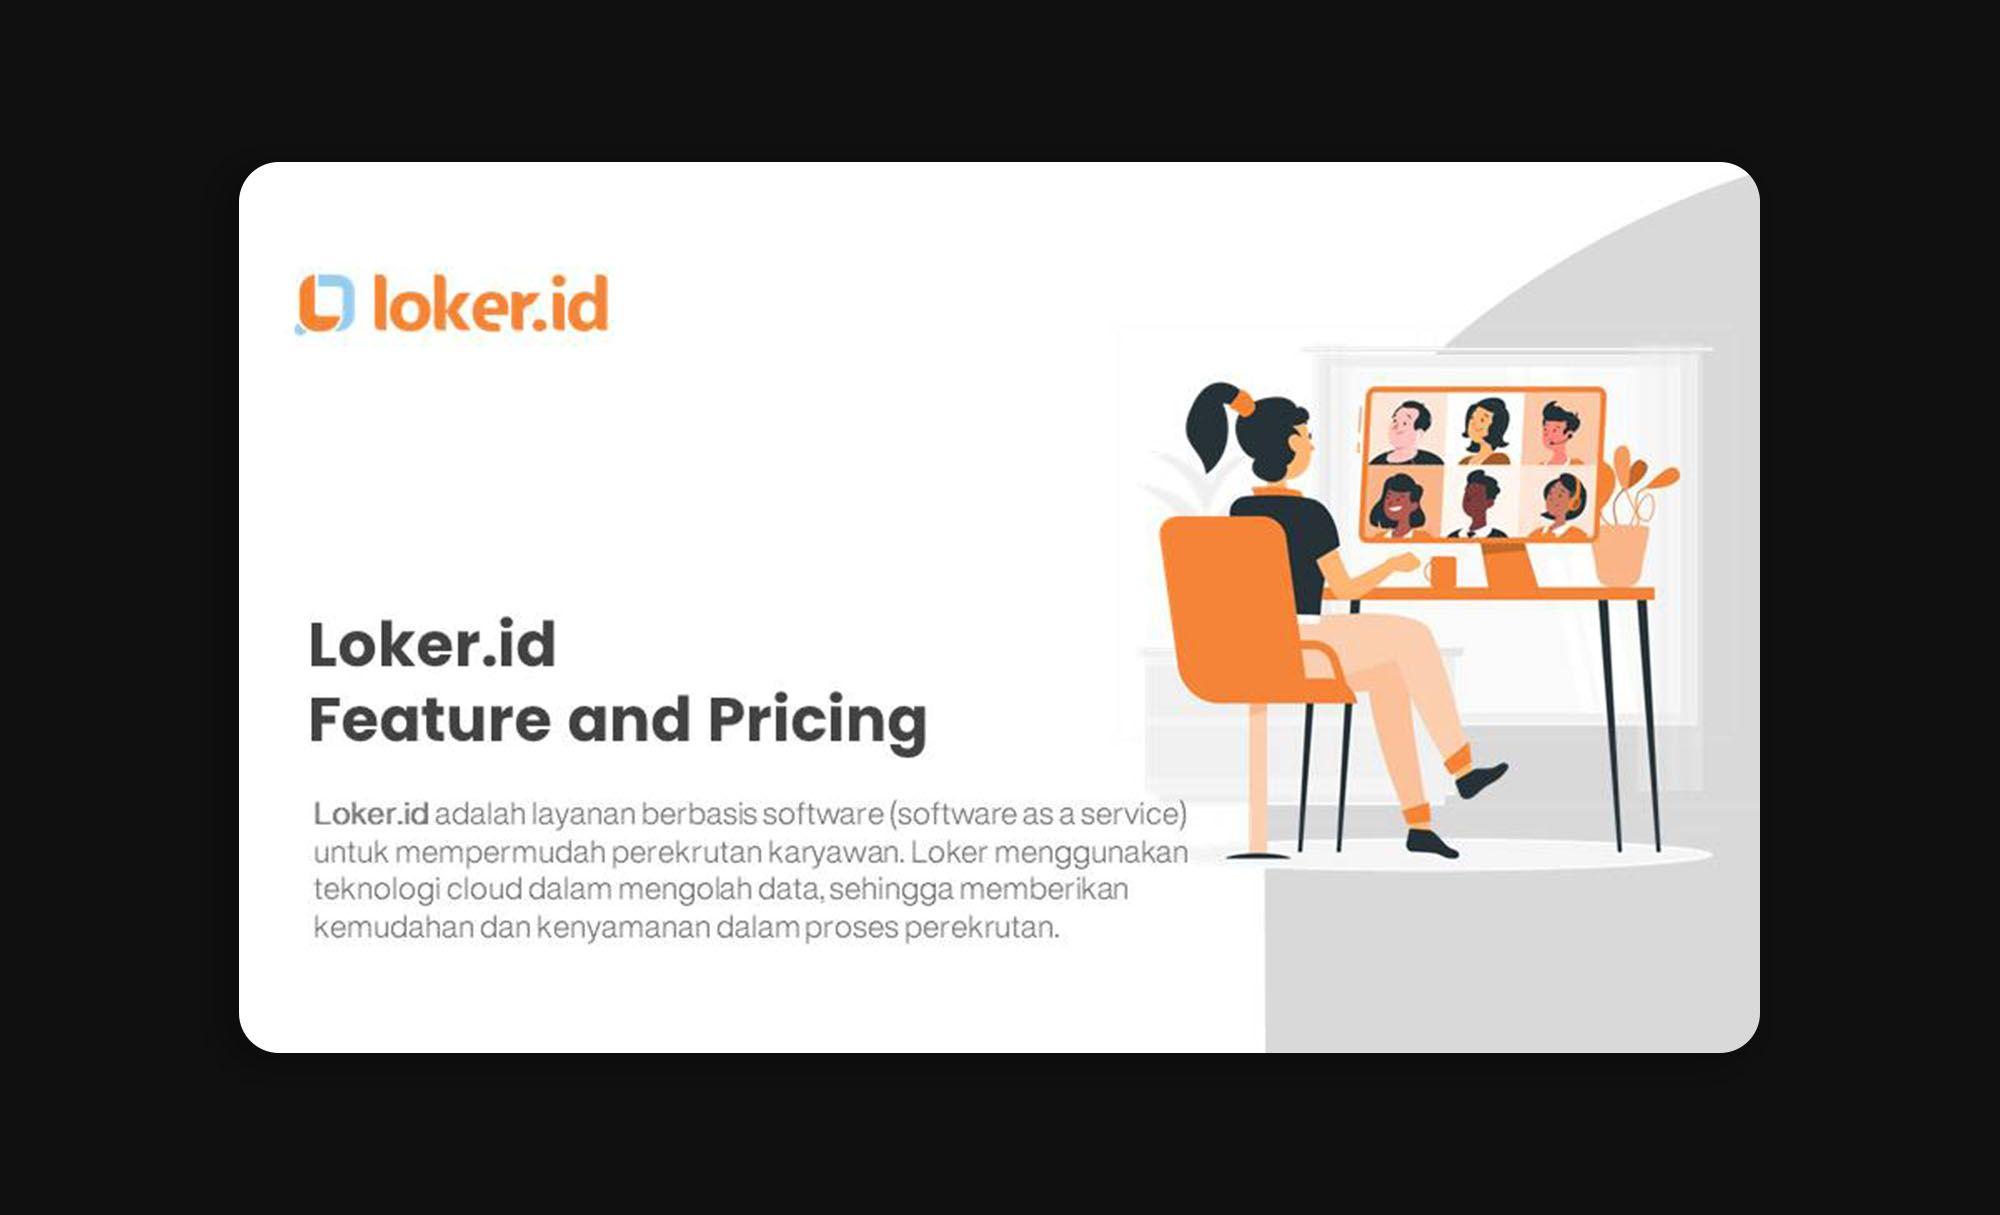 Loker.id : Pionir istilah loker identik dengan lowongan kerja